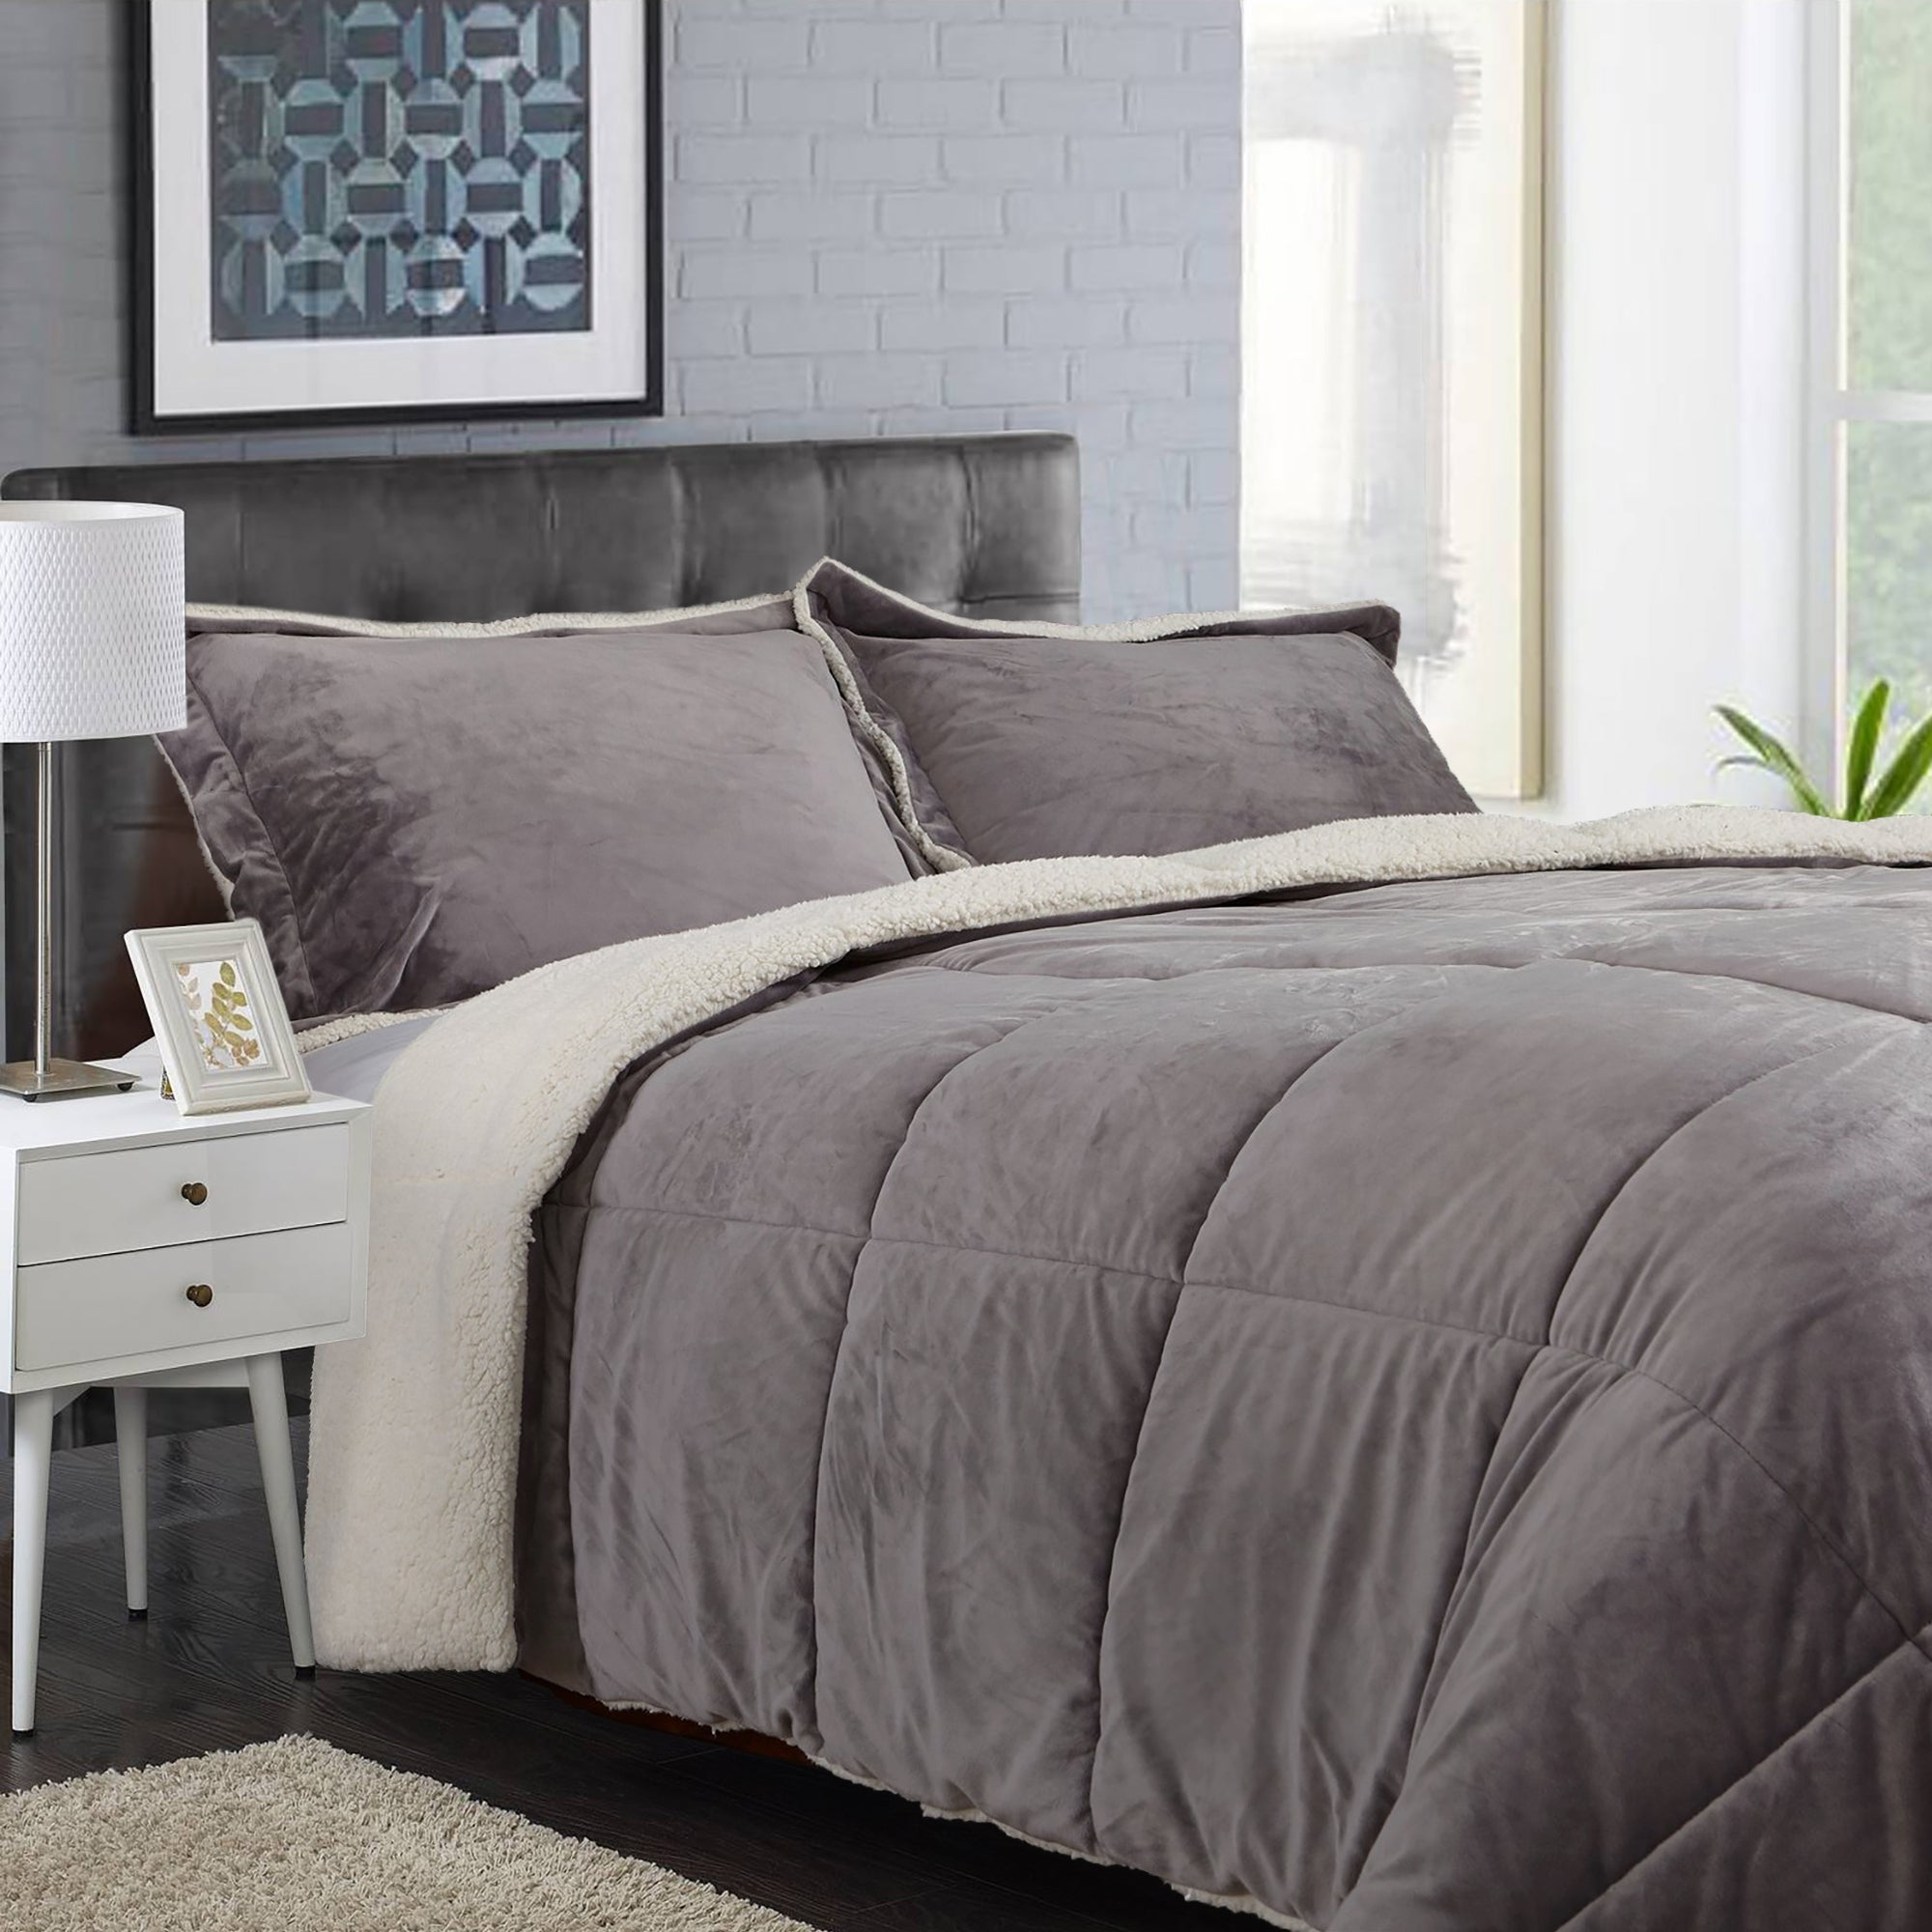 Reversible Fauxfur Sherpa Down Alternative Filled Comforter Set Overstock 31141929